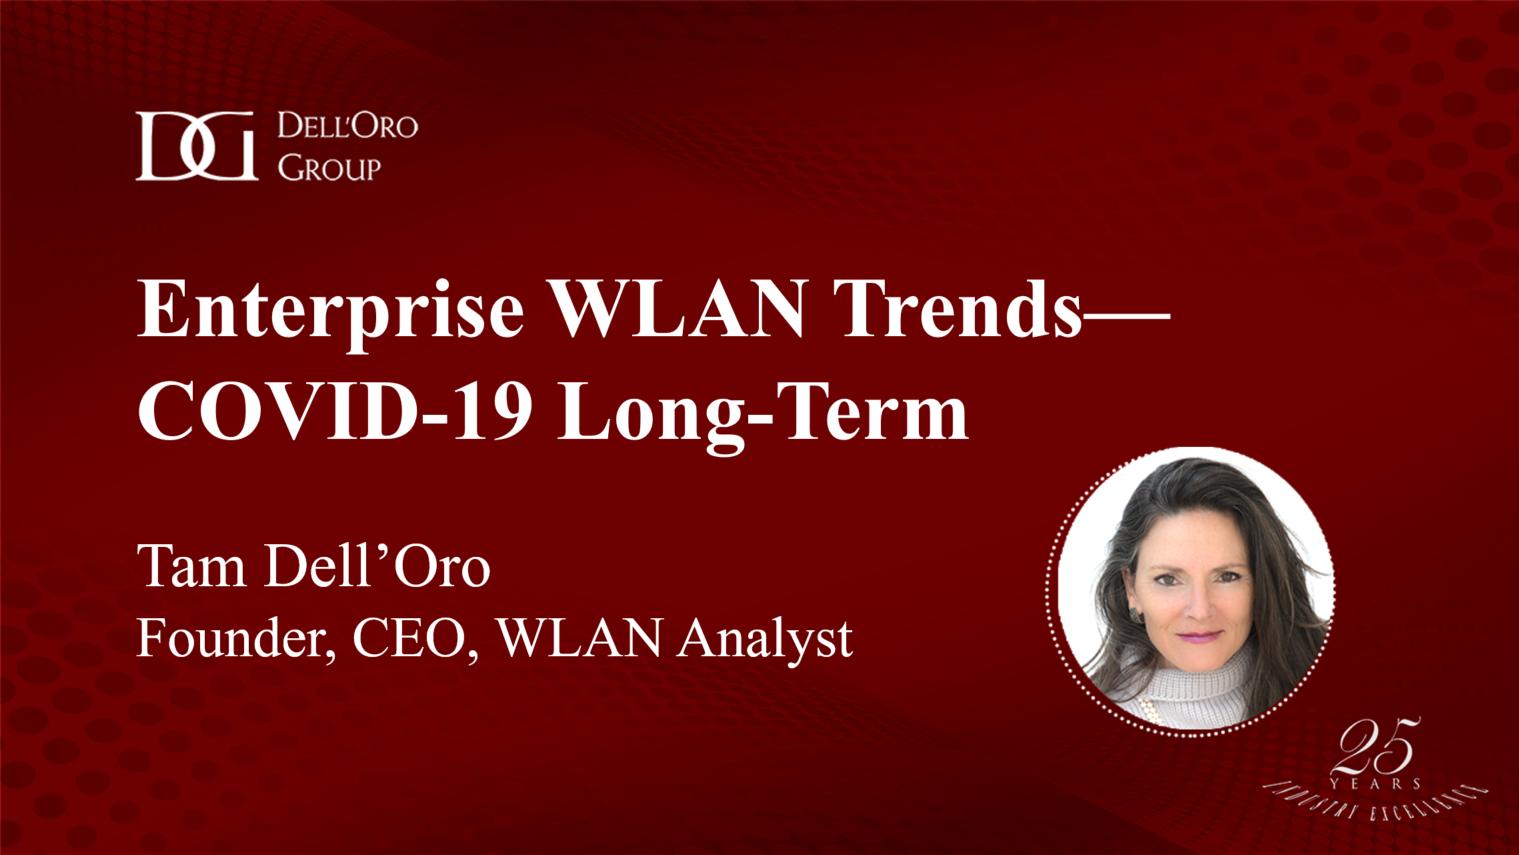 Analyst Talk - Enterprise WLAN Trends COVID-19 Long-Term